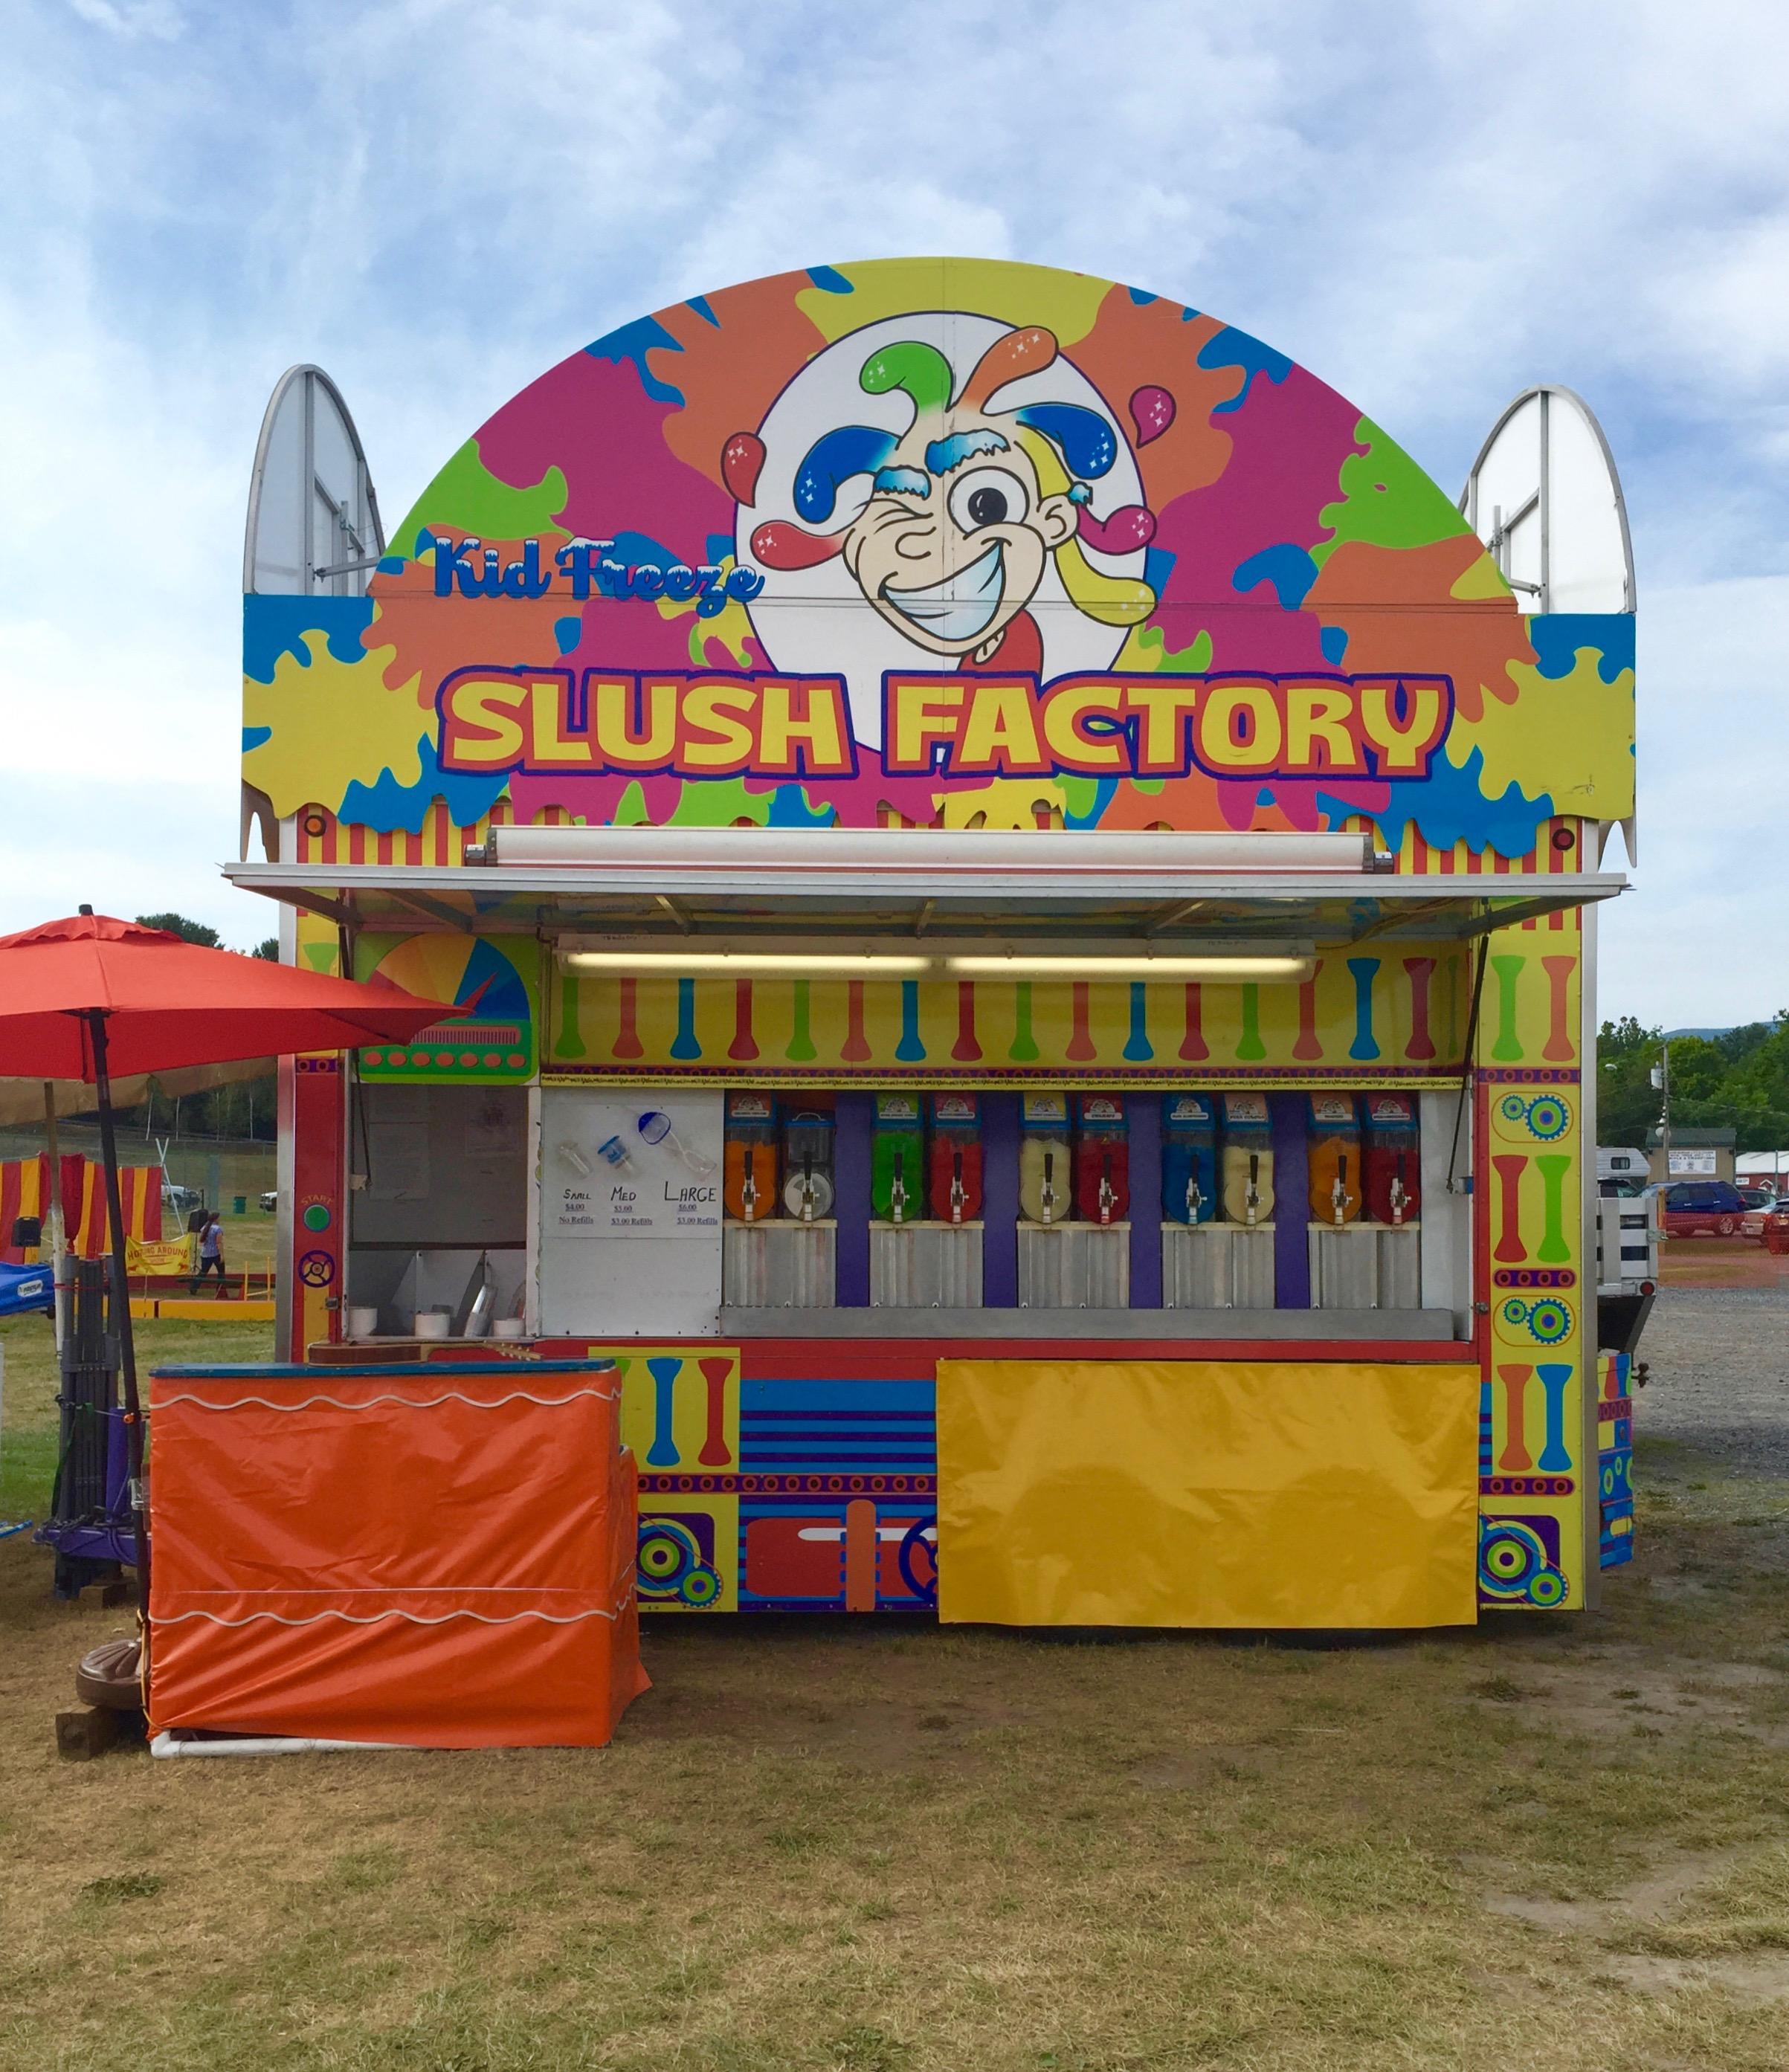 Slush Factory at Greene County Youth Fair